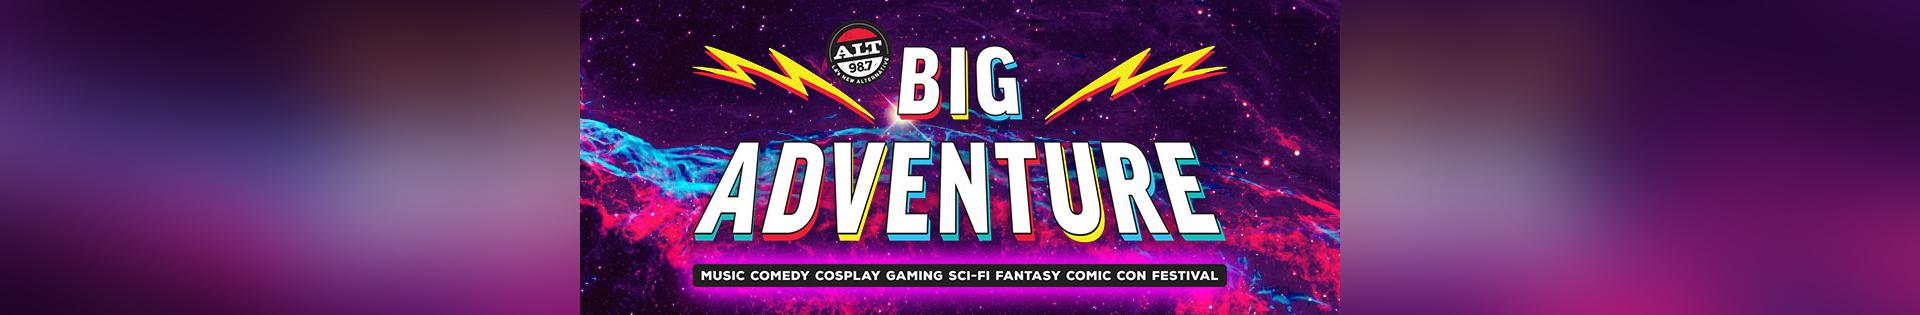 BigAdventure_Logo.jpg